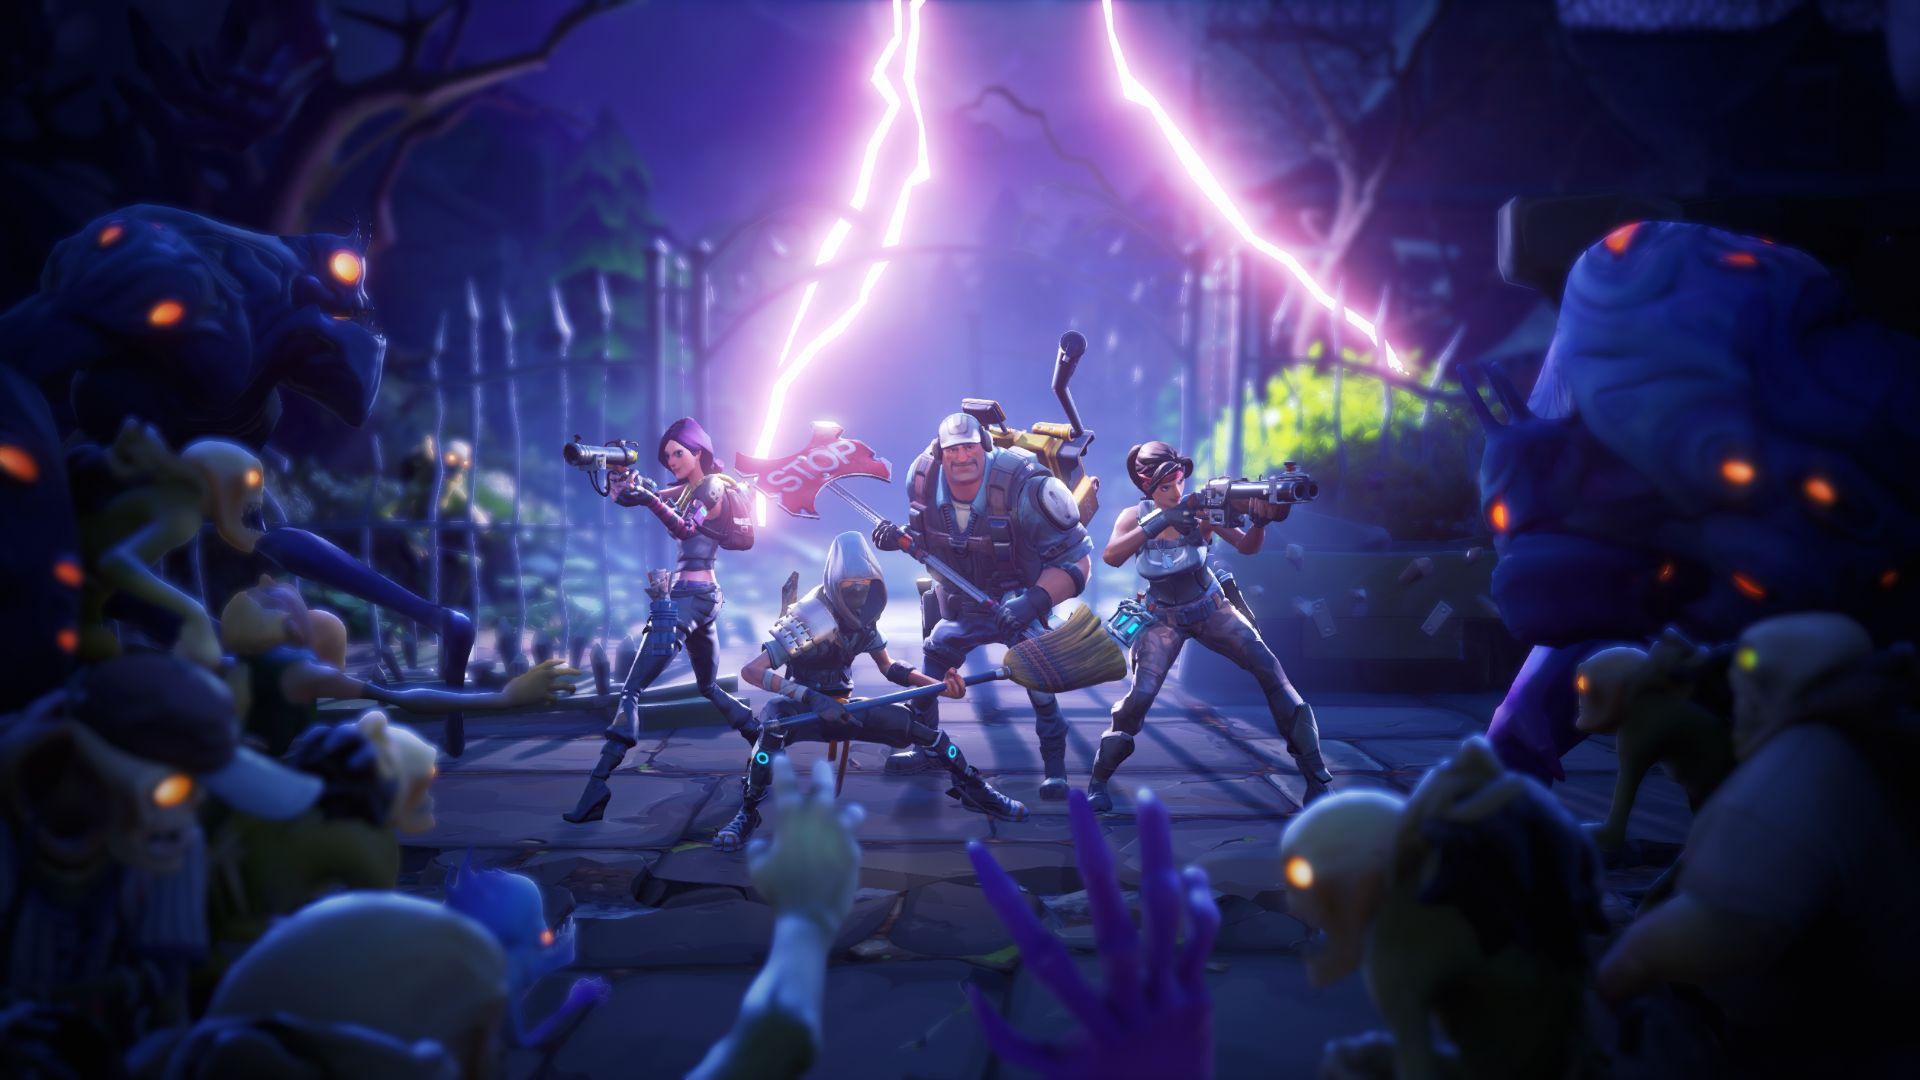 Nový gameplay trailer z Fortnite 109762